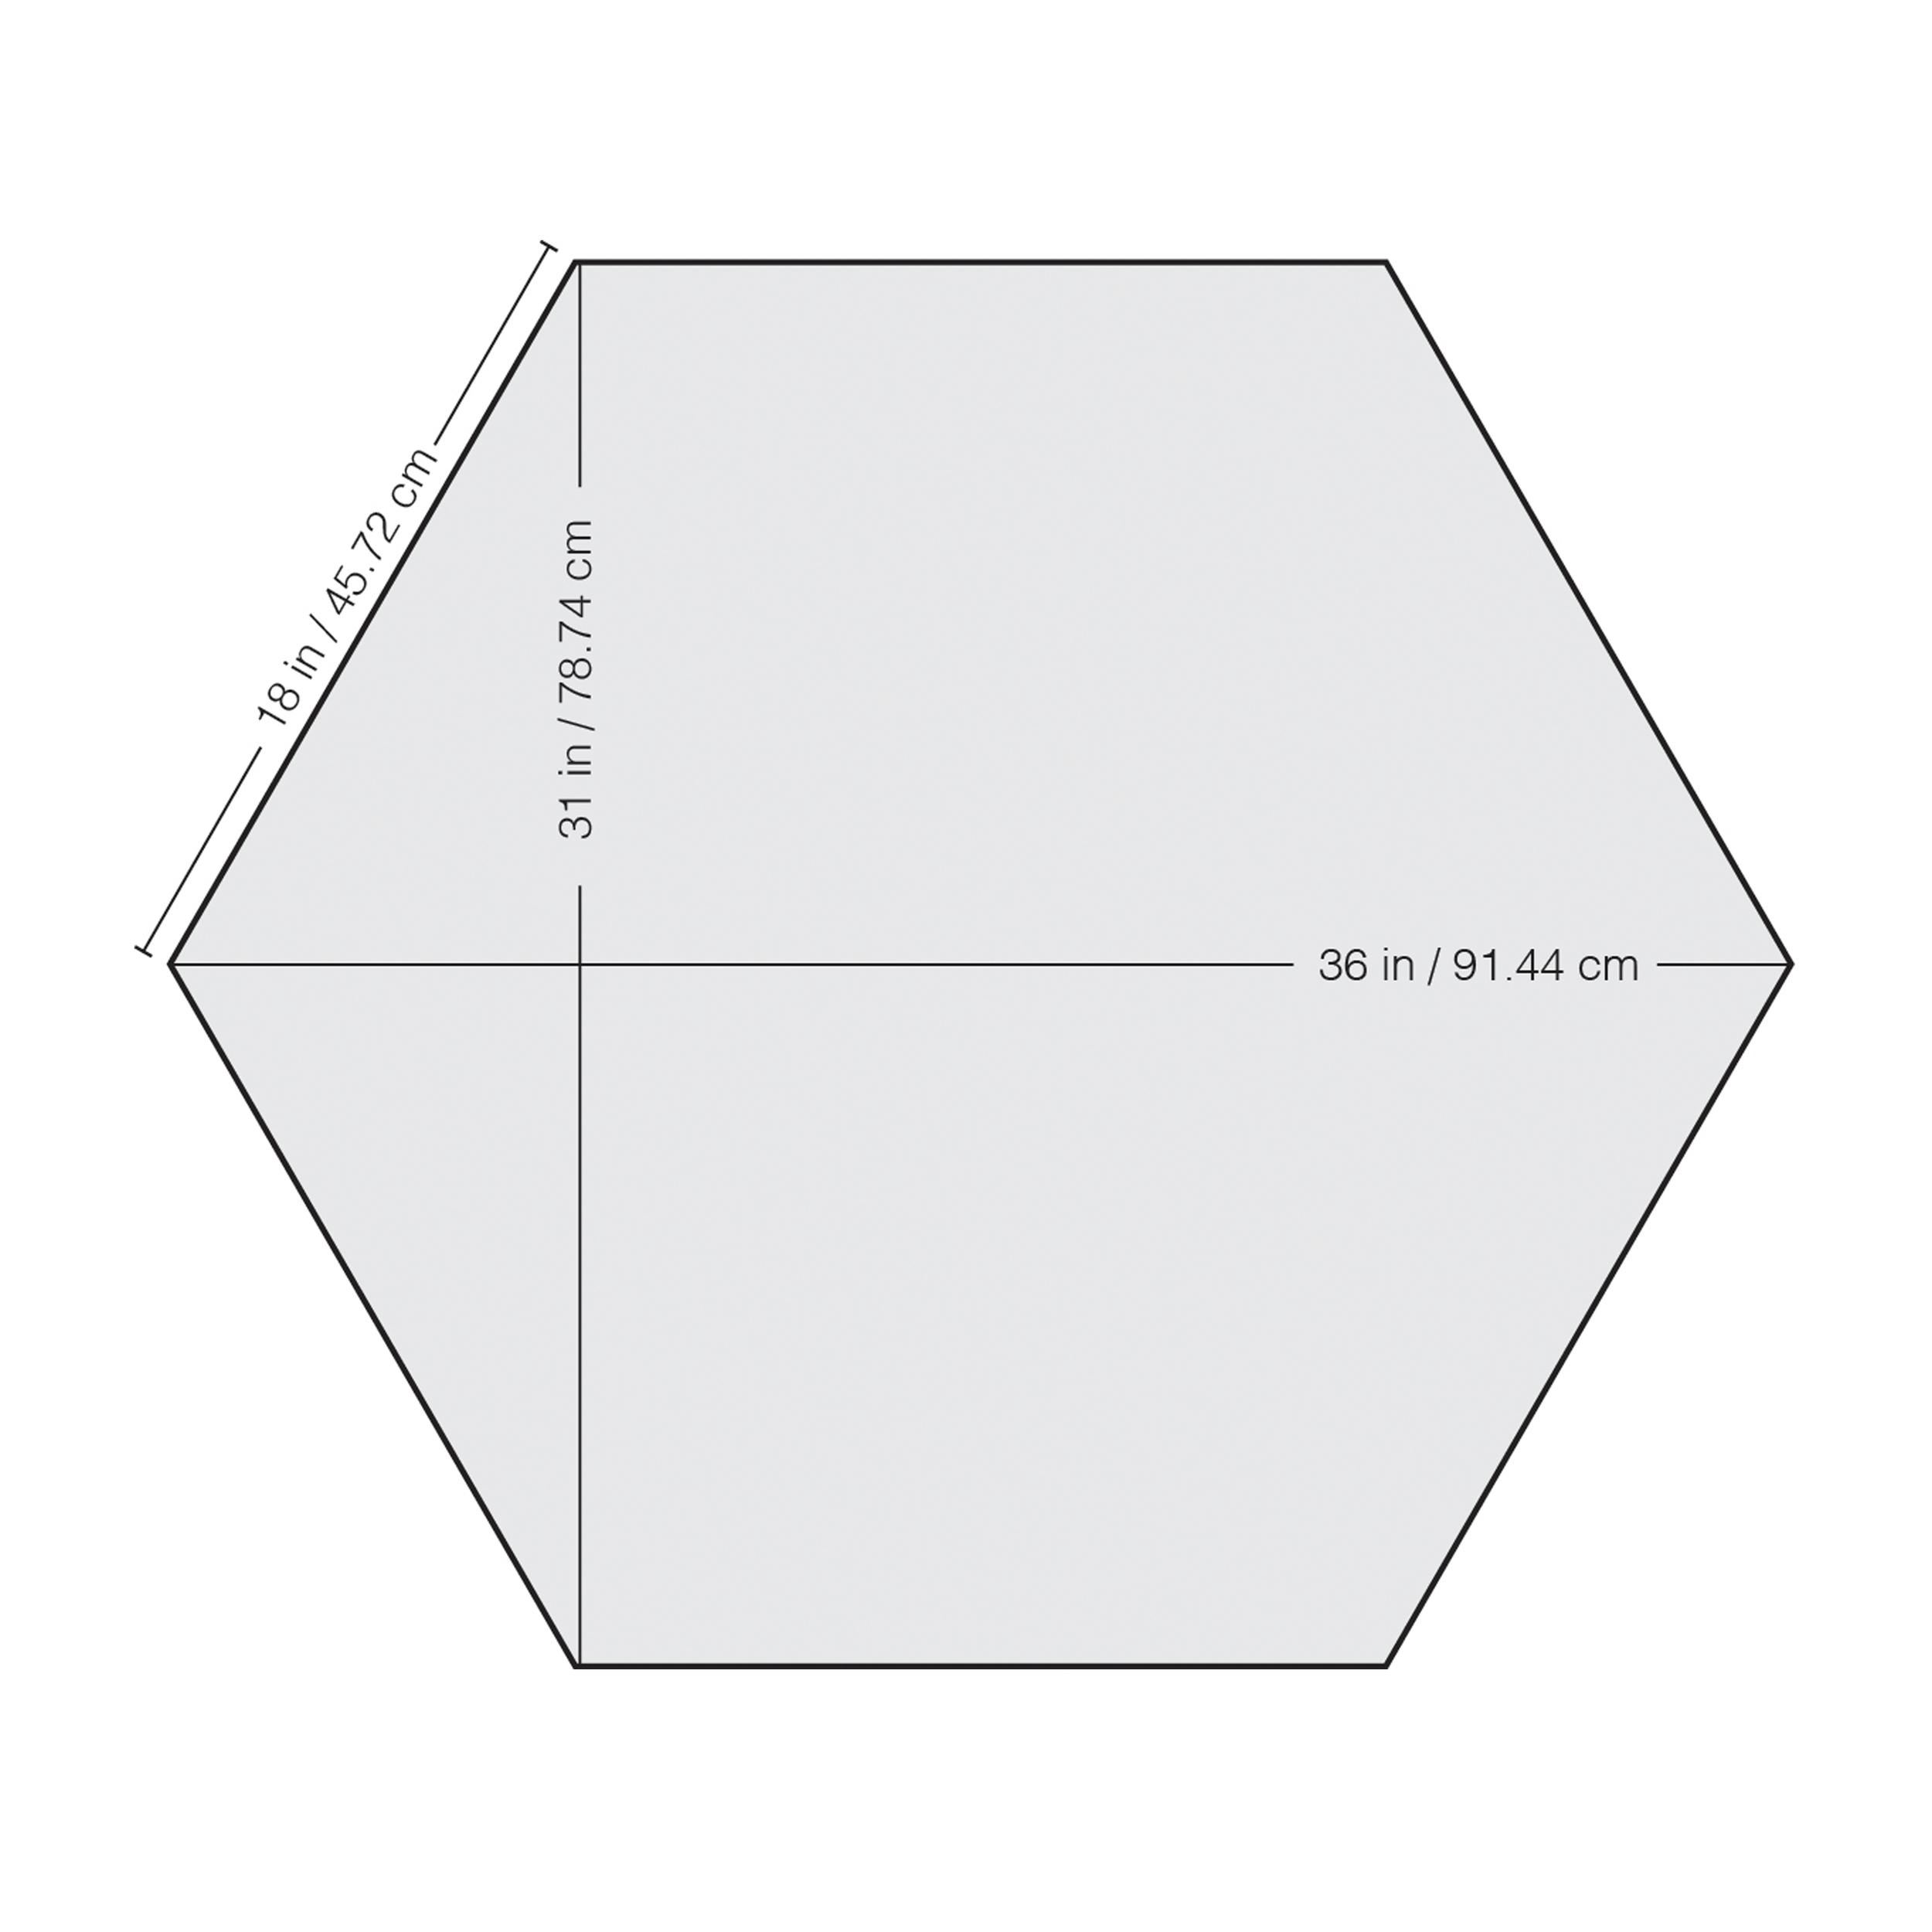 Hexagon_size.jpg